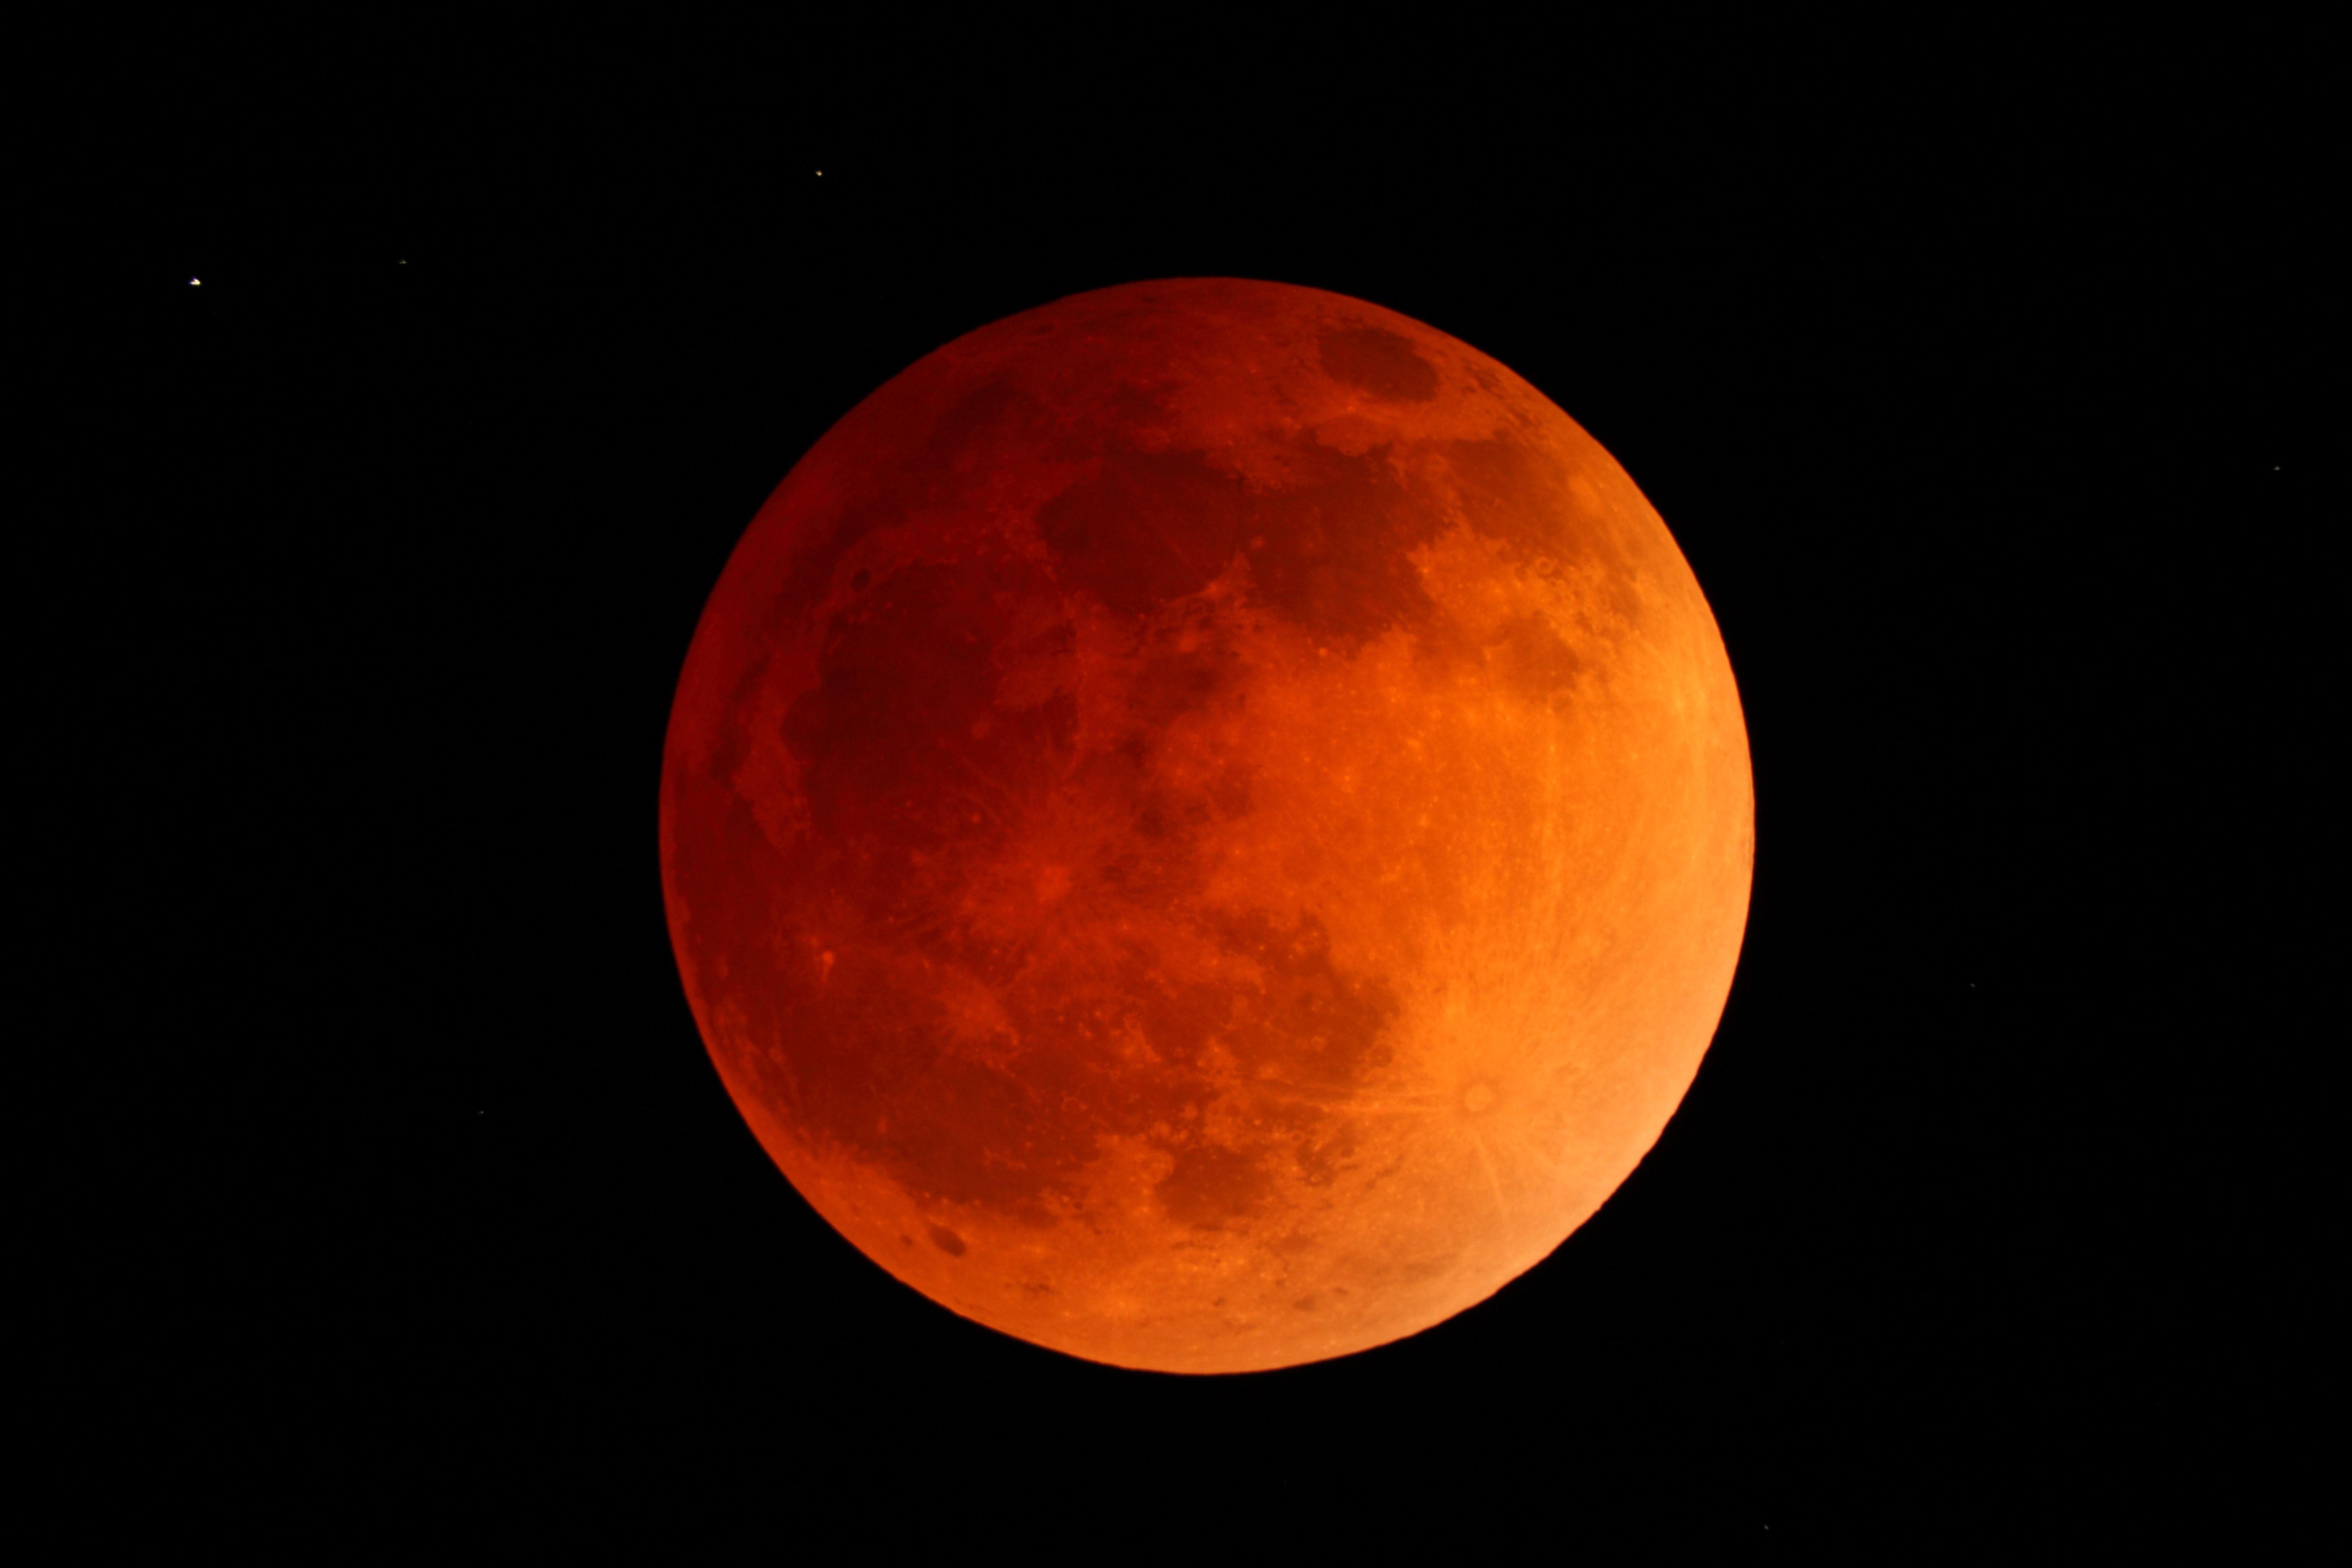 lunar eclipse and the blood moon. Black Bedroom Furniture Sets. Home Design Ideas